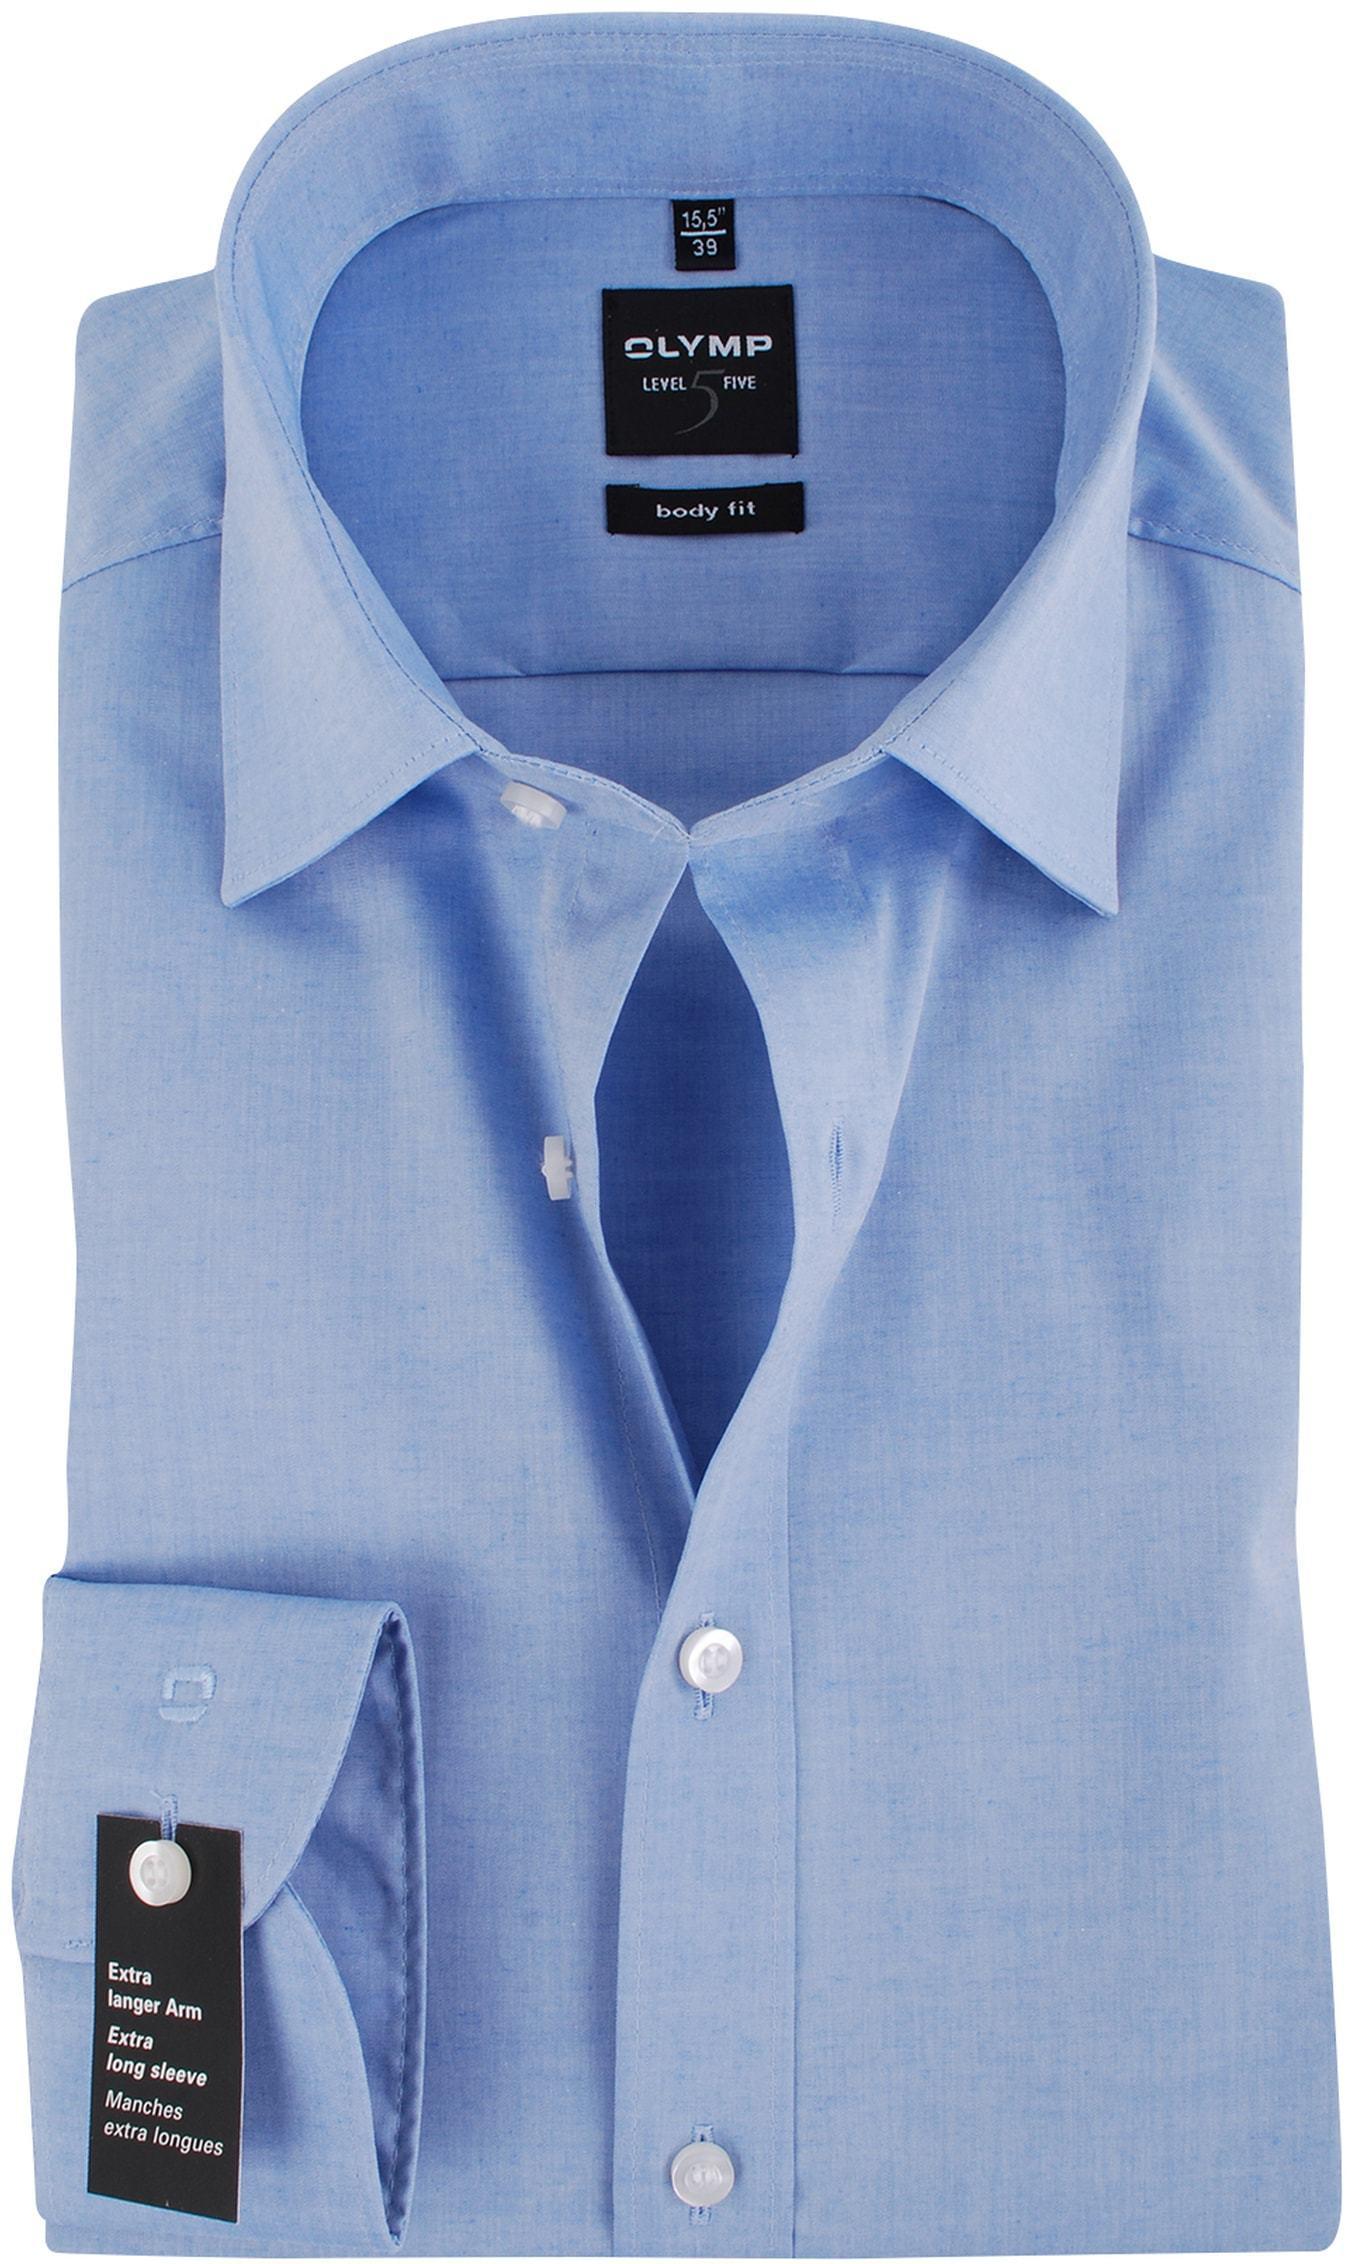 OLYMP Level Five Overhemd SL7 Body Fit Blauw